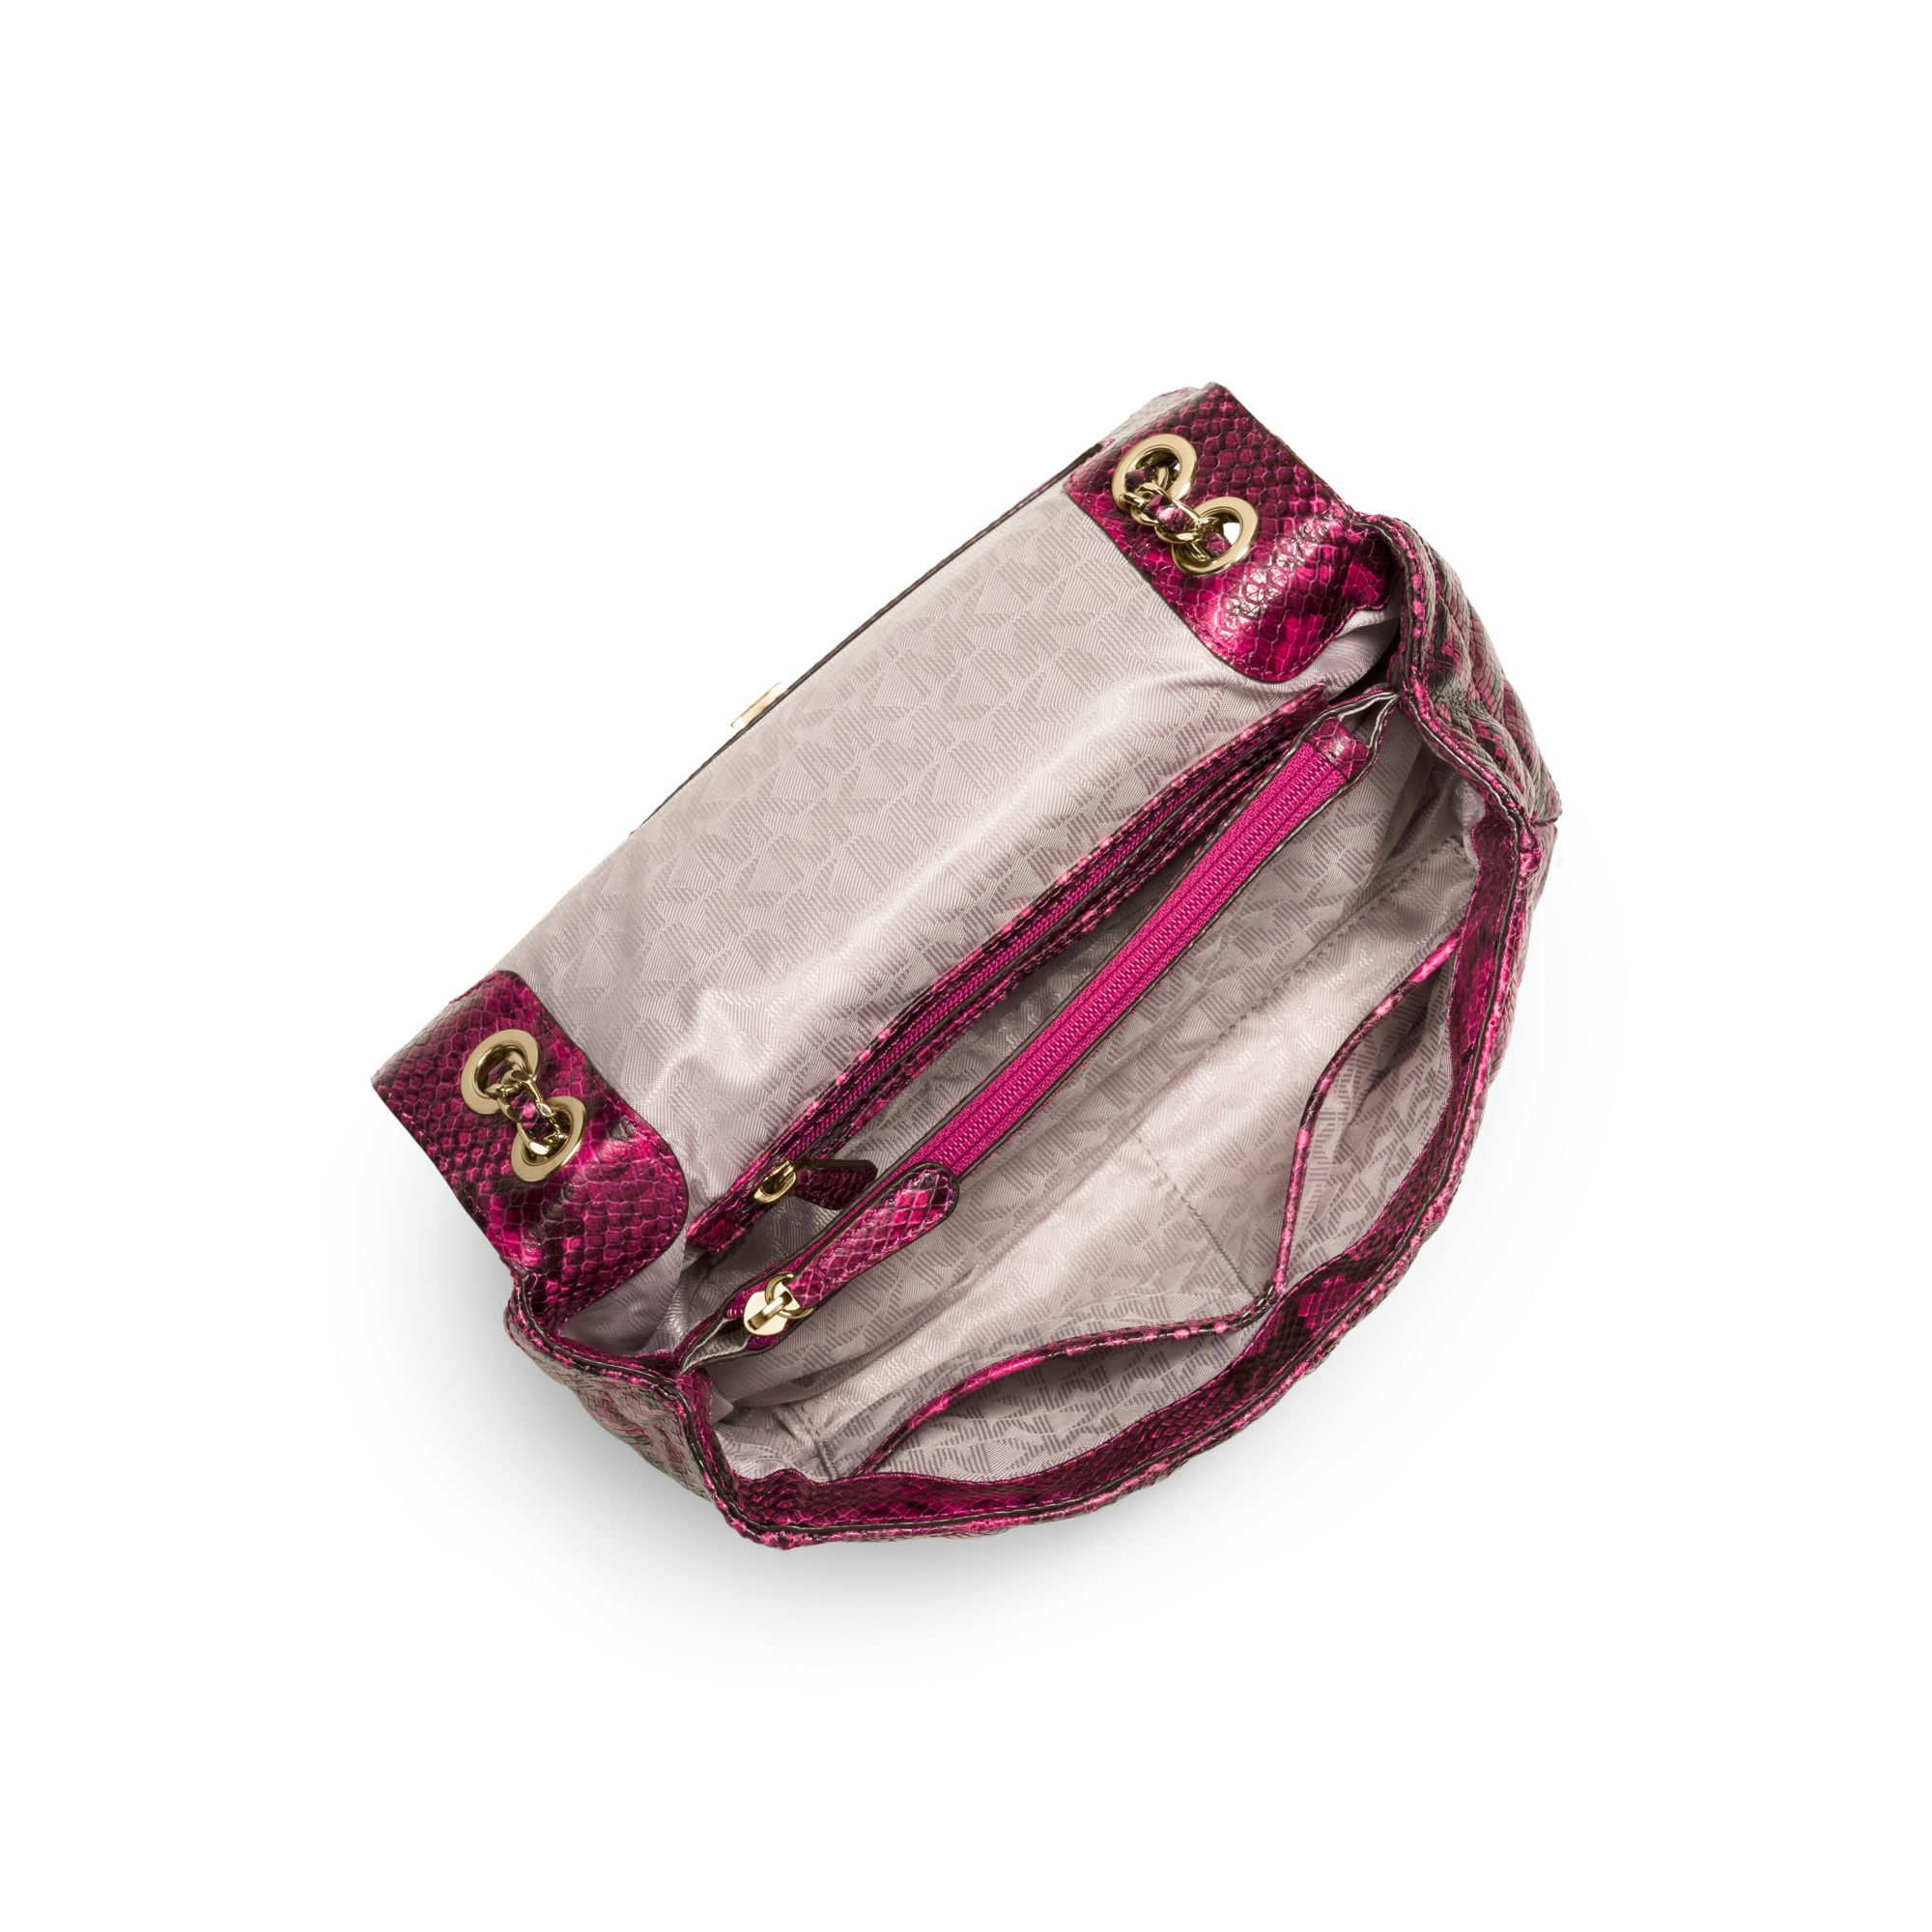 50940e600c936d Gallery. Women's Michael By Michael Kors Sloan Women's Michael Kors Quilted  Bag